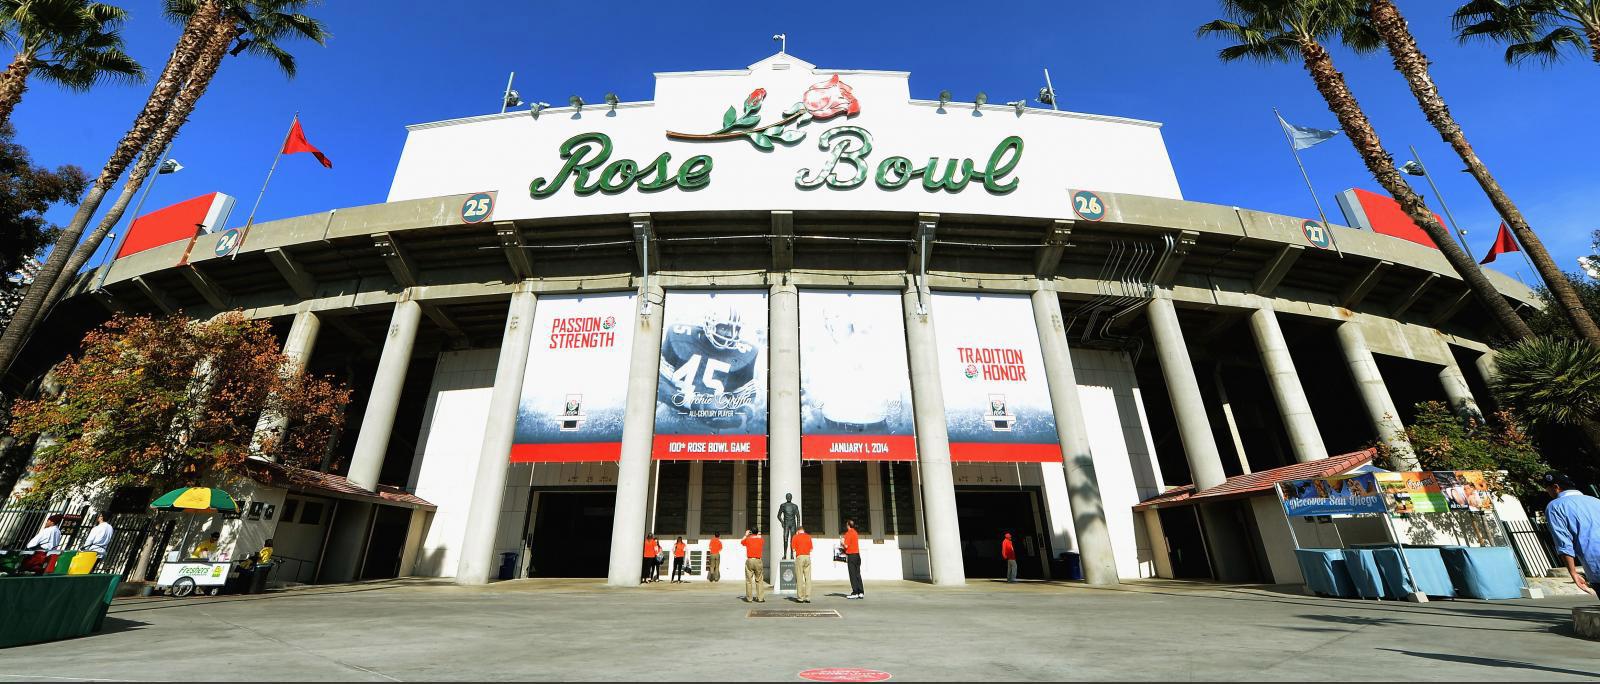 Rose-Bowl-Stadium.jpg